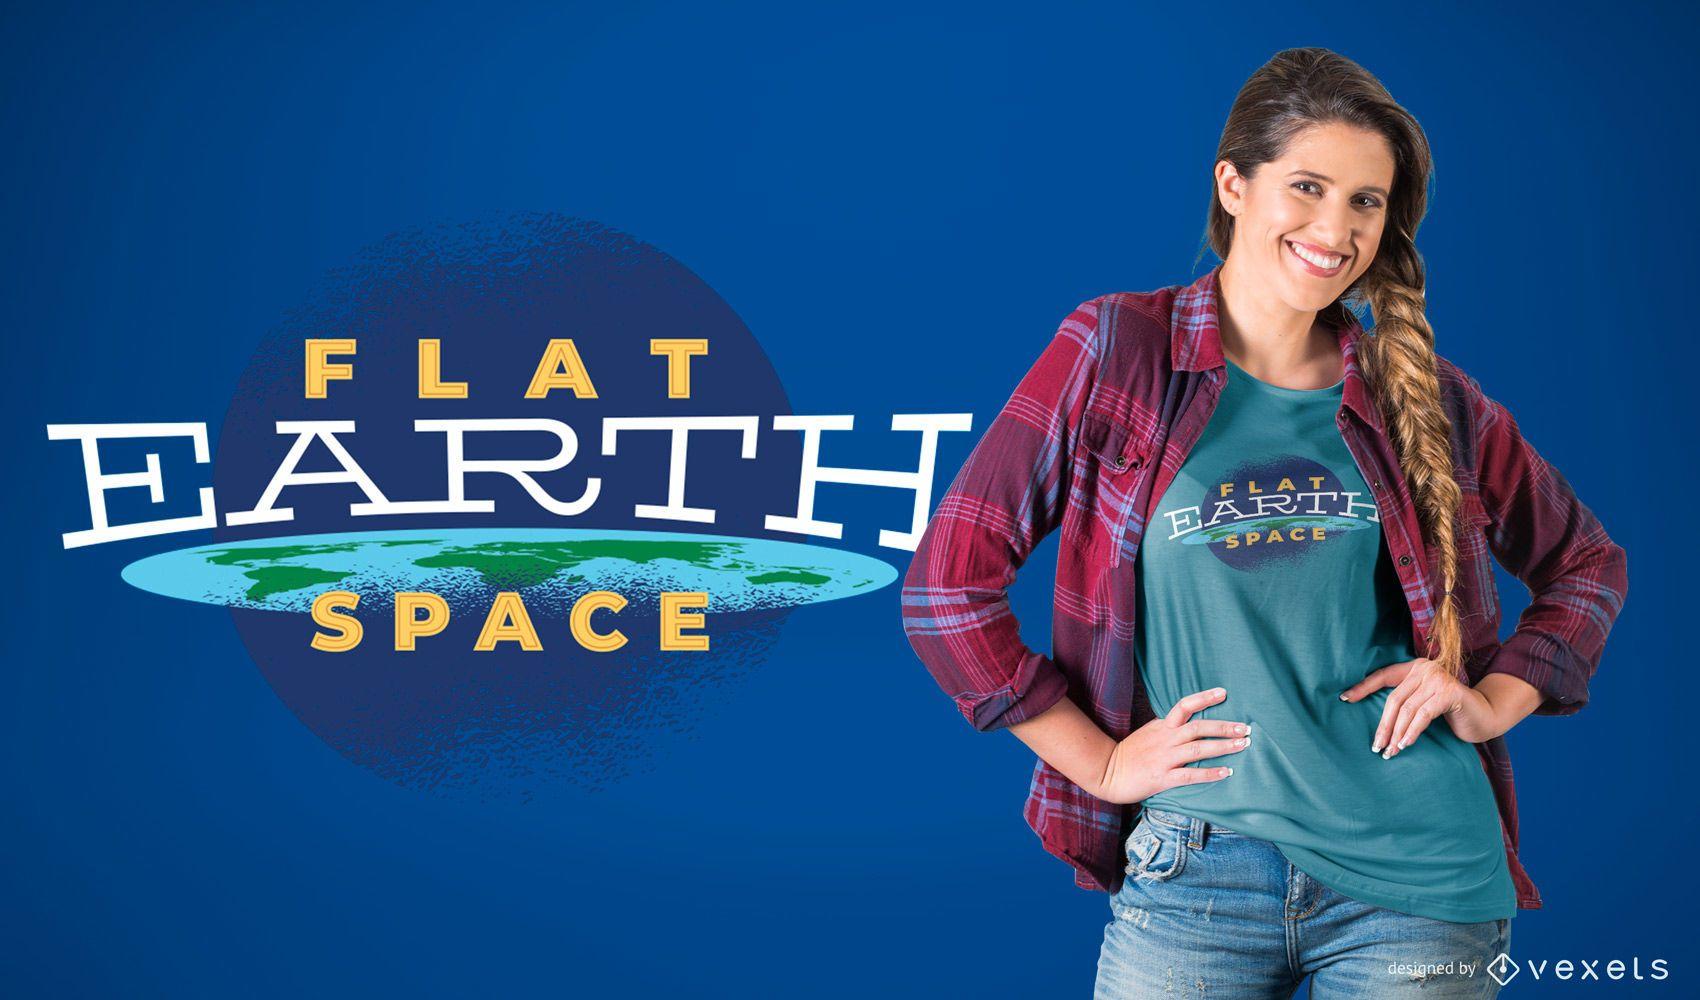 Flat Earth space T-Shirt Design